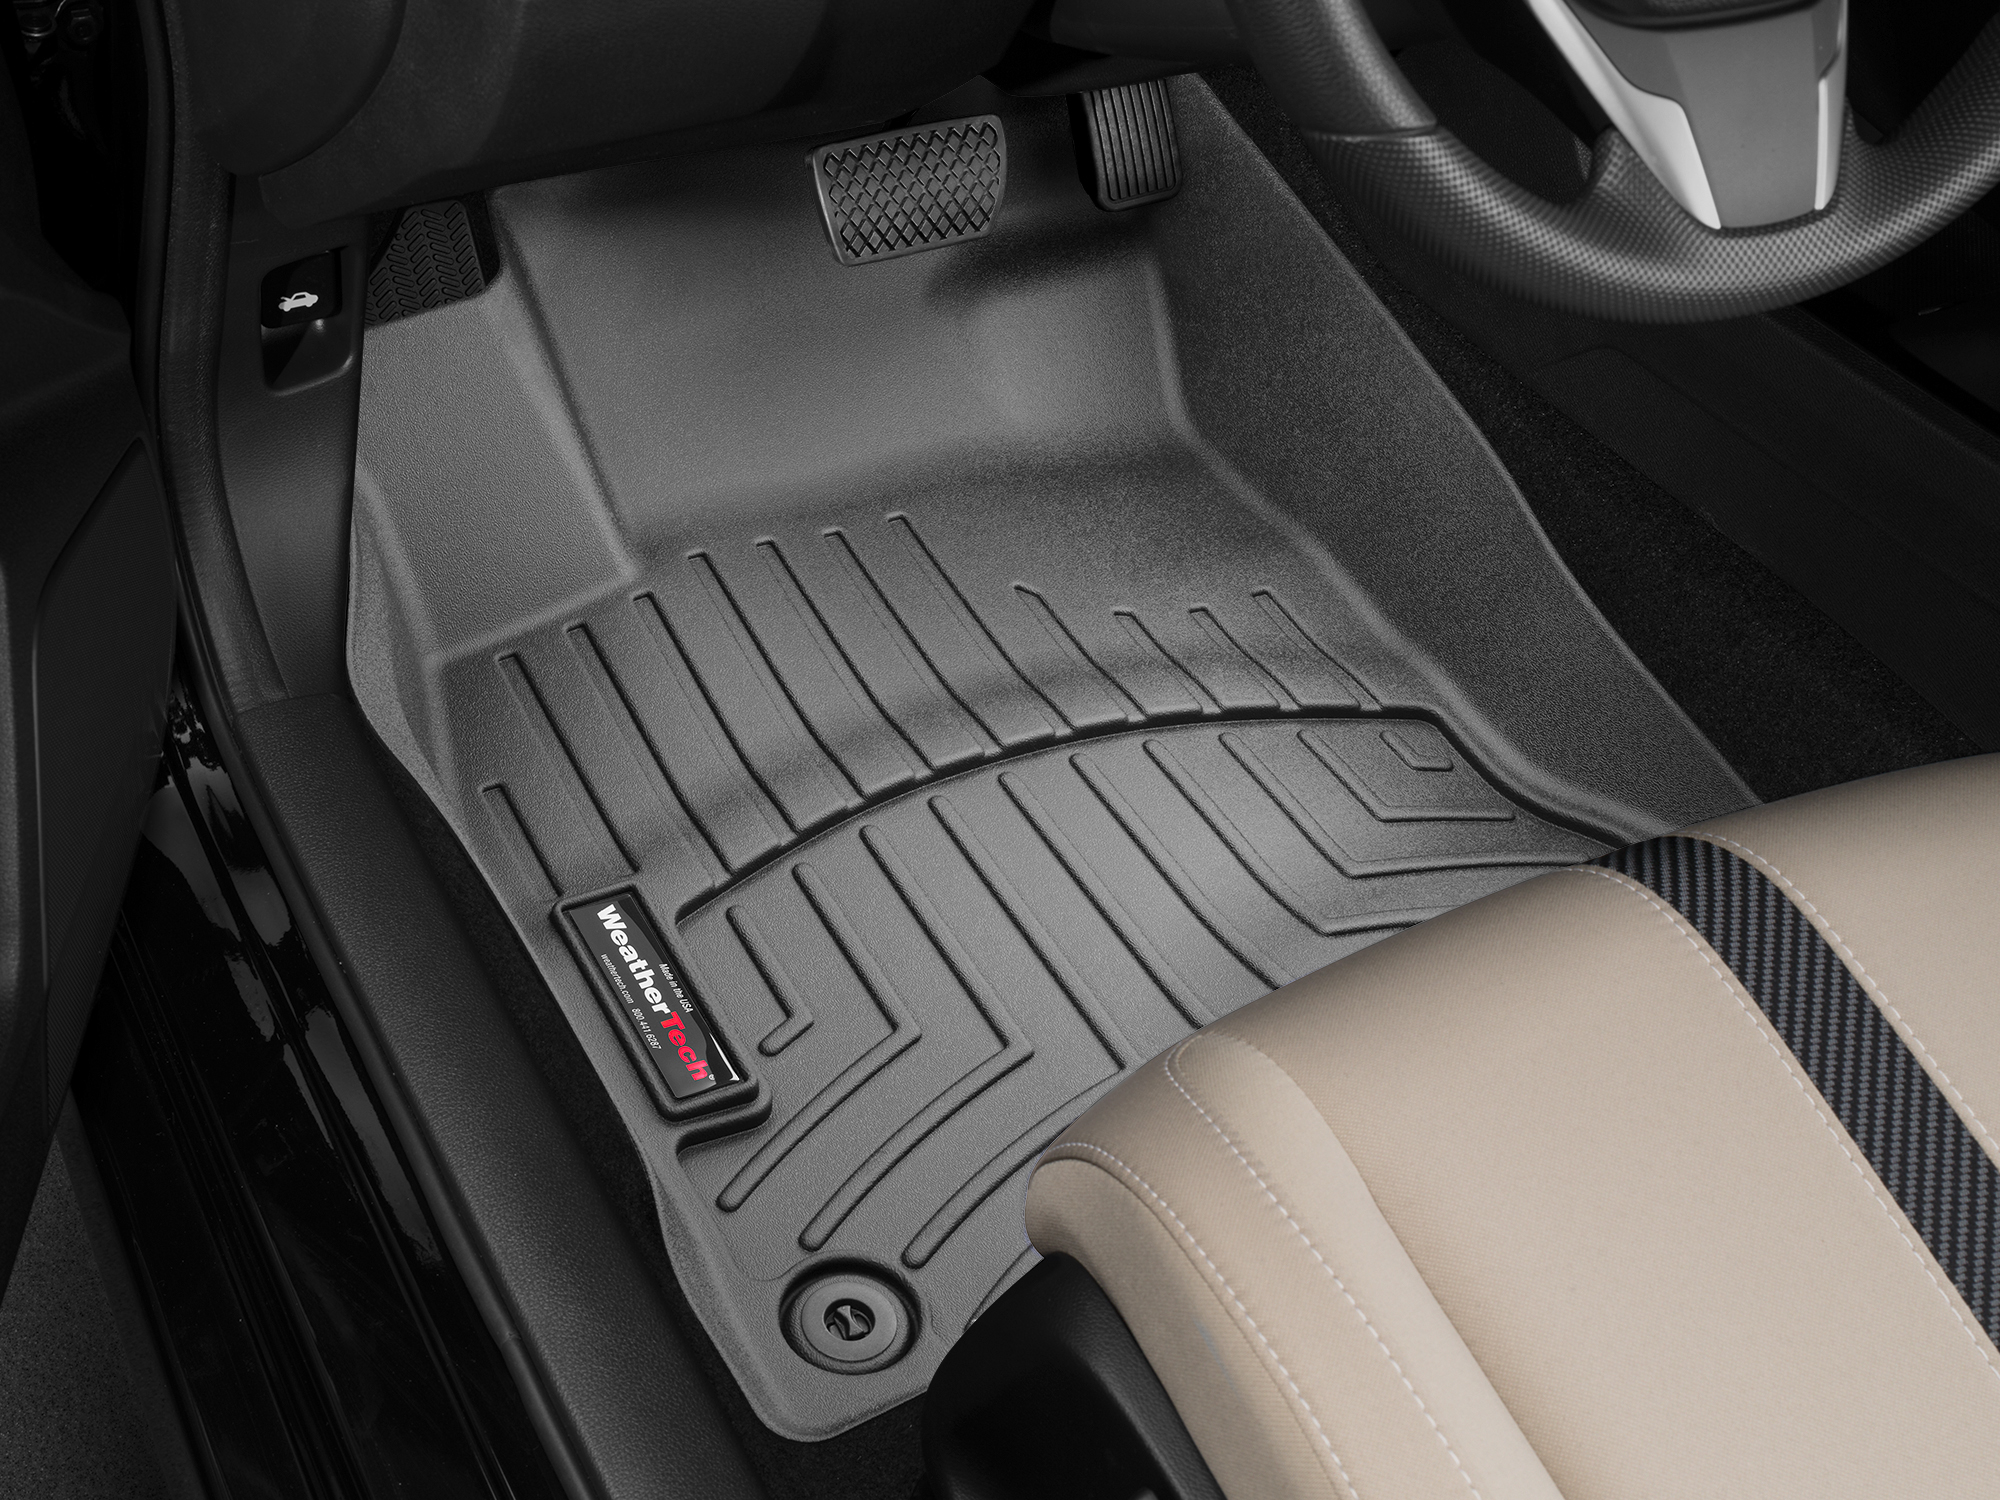 2017 Honda Civic Avm Hd Floor Mats Heavy Duty Flexible Trim To Fit Weathertech